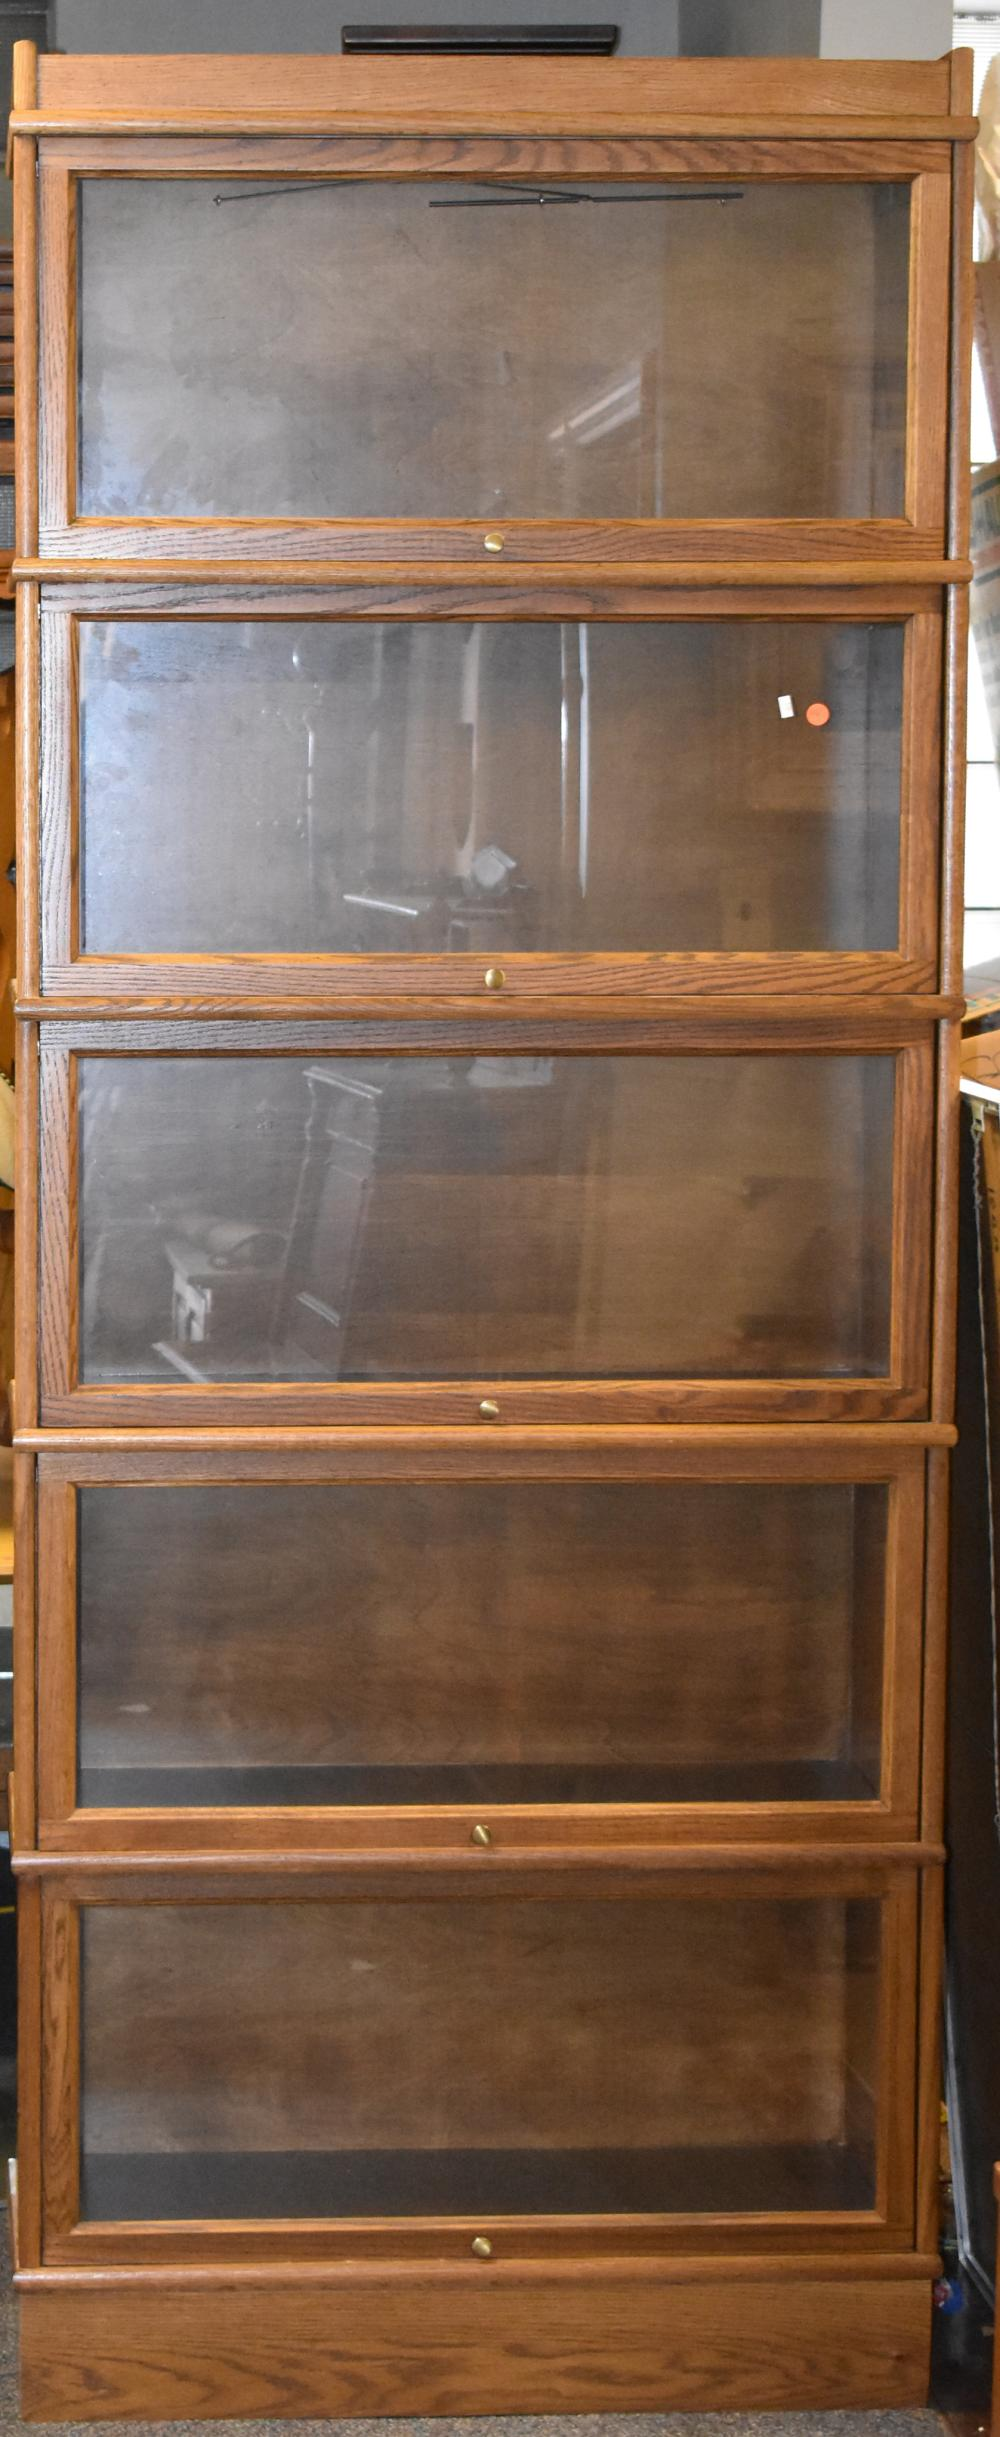 Hale Oak 5 Section Barrister Bookcase